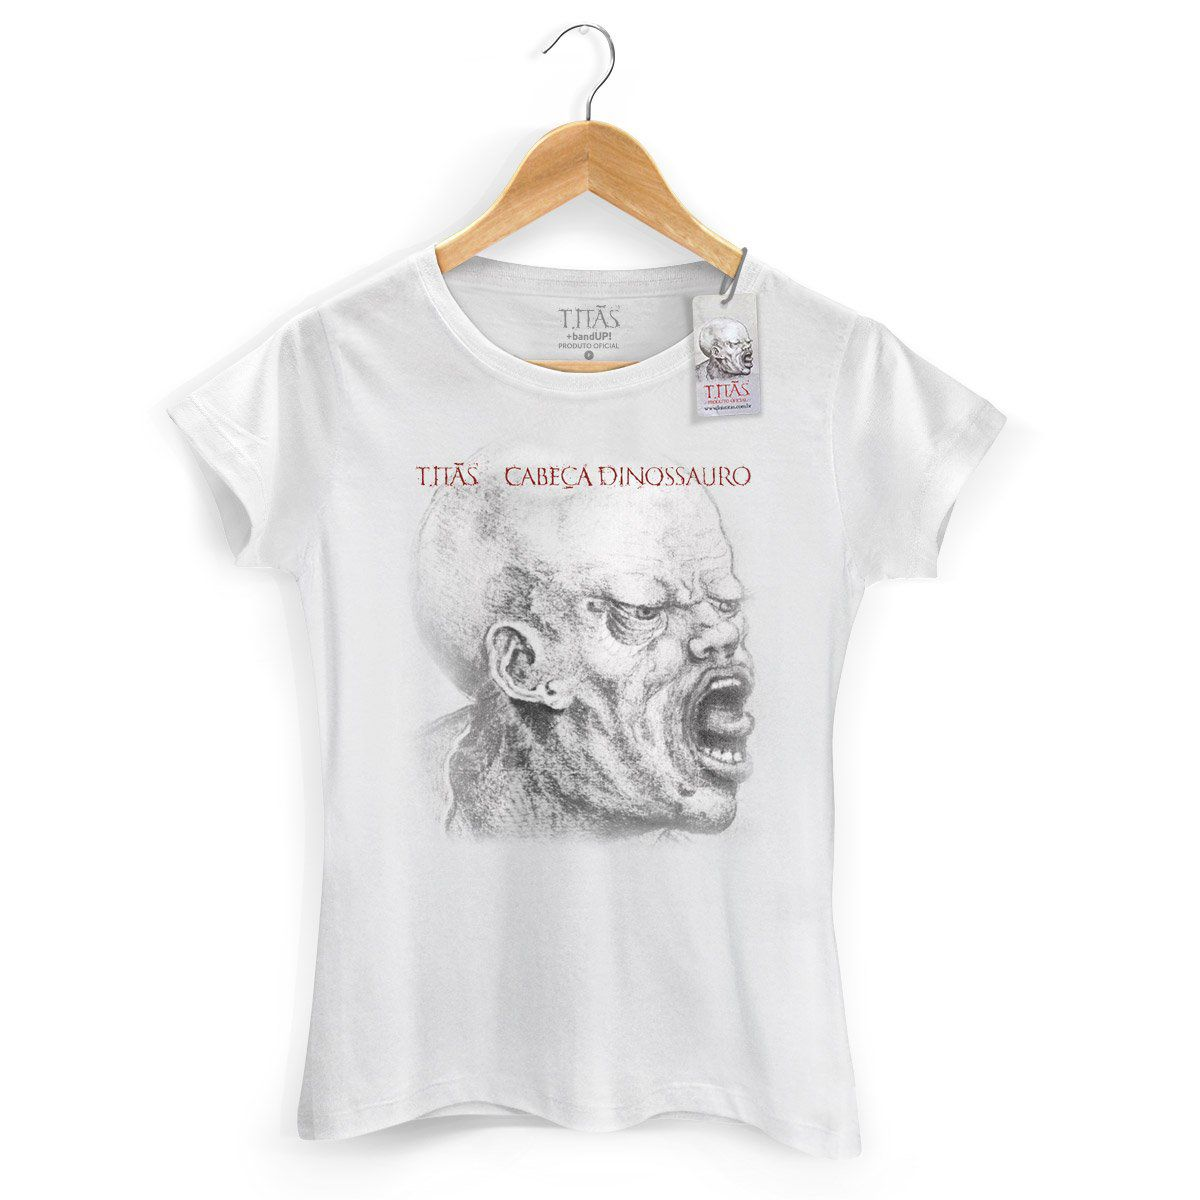 Camiseta Feminina Titãs Cabeça Dinossauro  - bandUP Store Marketplace